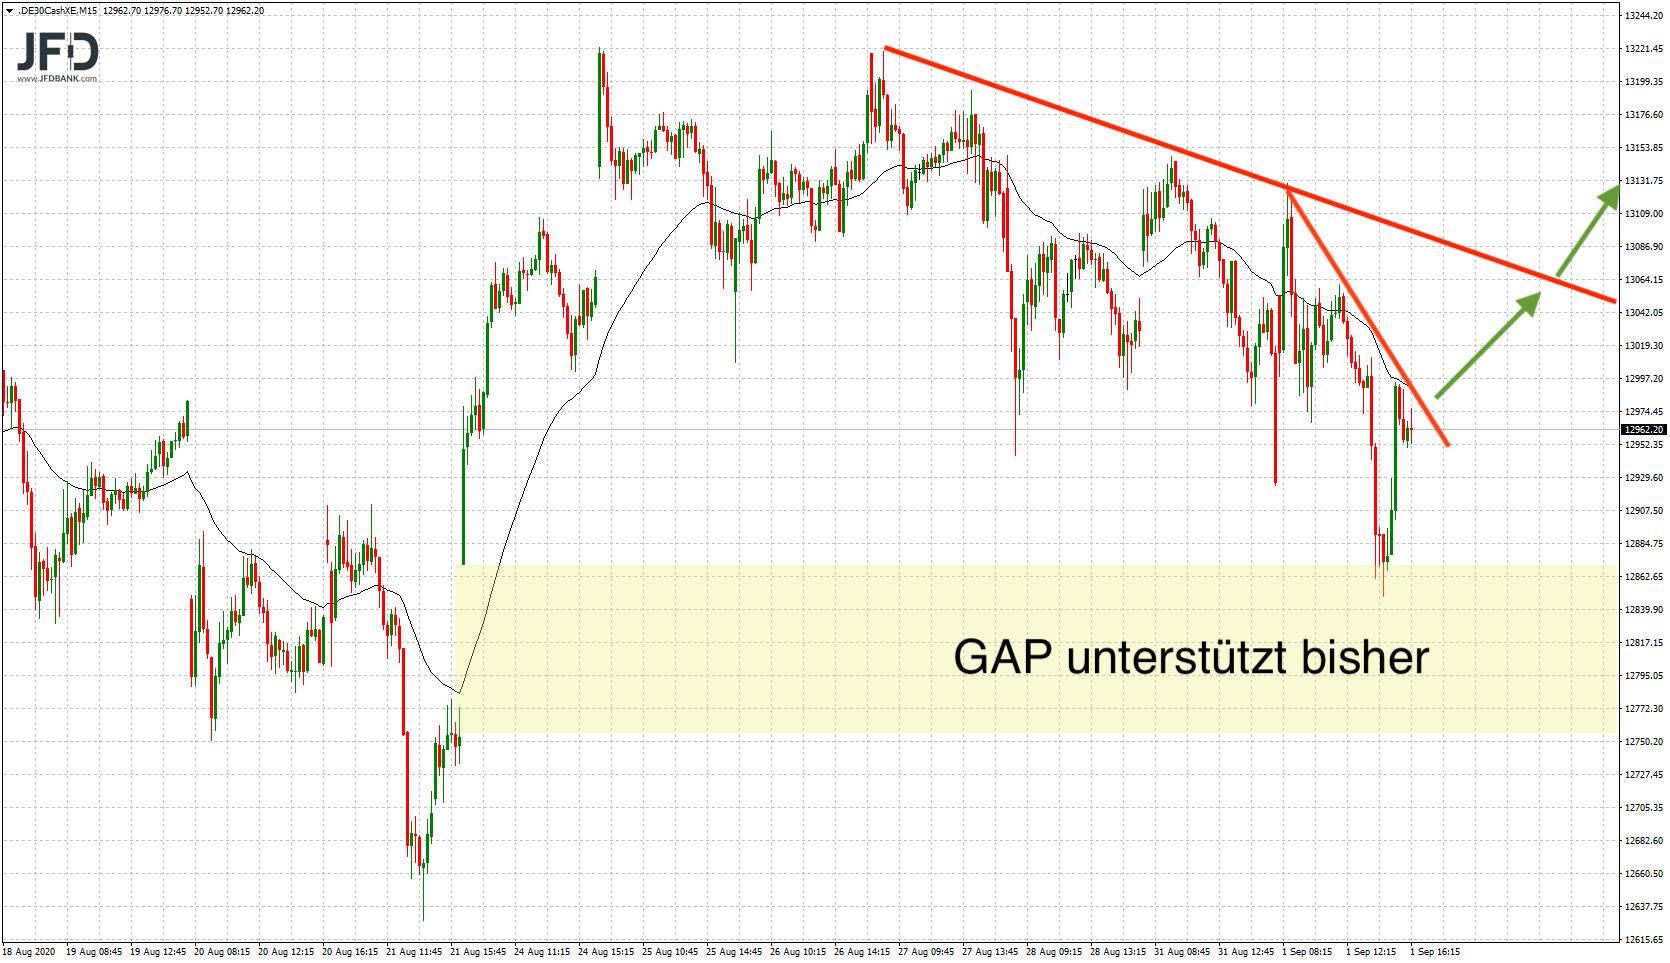 DAX-volatil-in-den-September-gestartet-Kommentar-JFD-Bank-GodmodeTrader.de-7